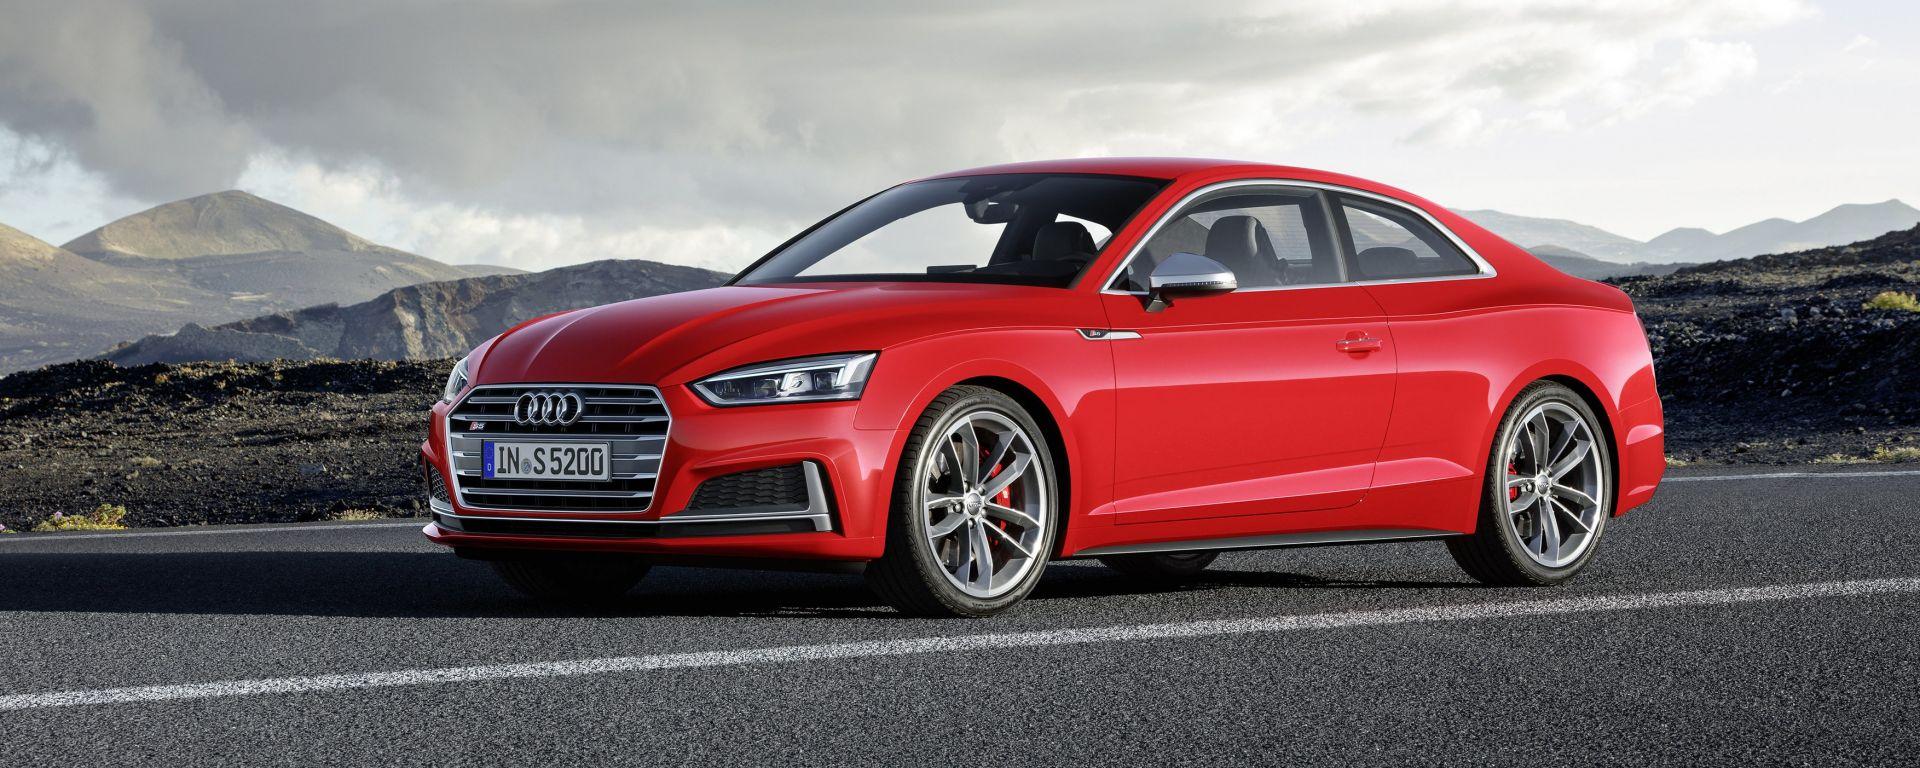 Audi A5 Coupé MY 2017: dotazioni, motori, tecnologia